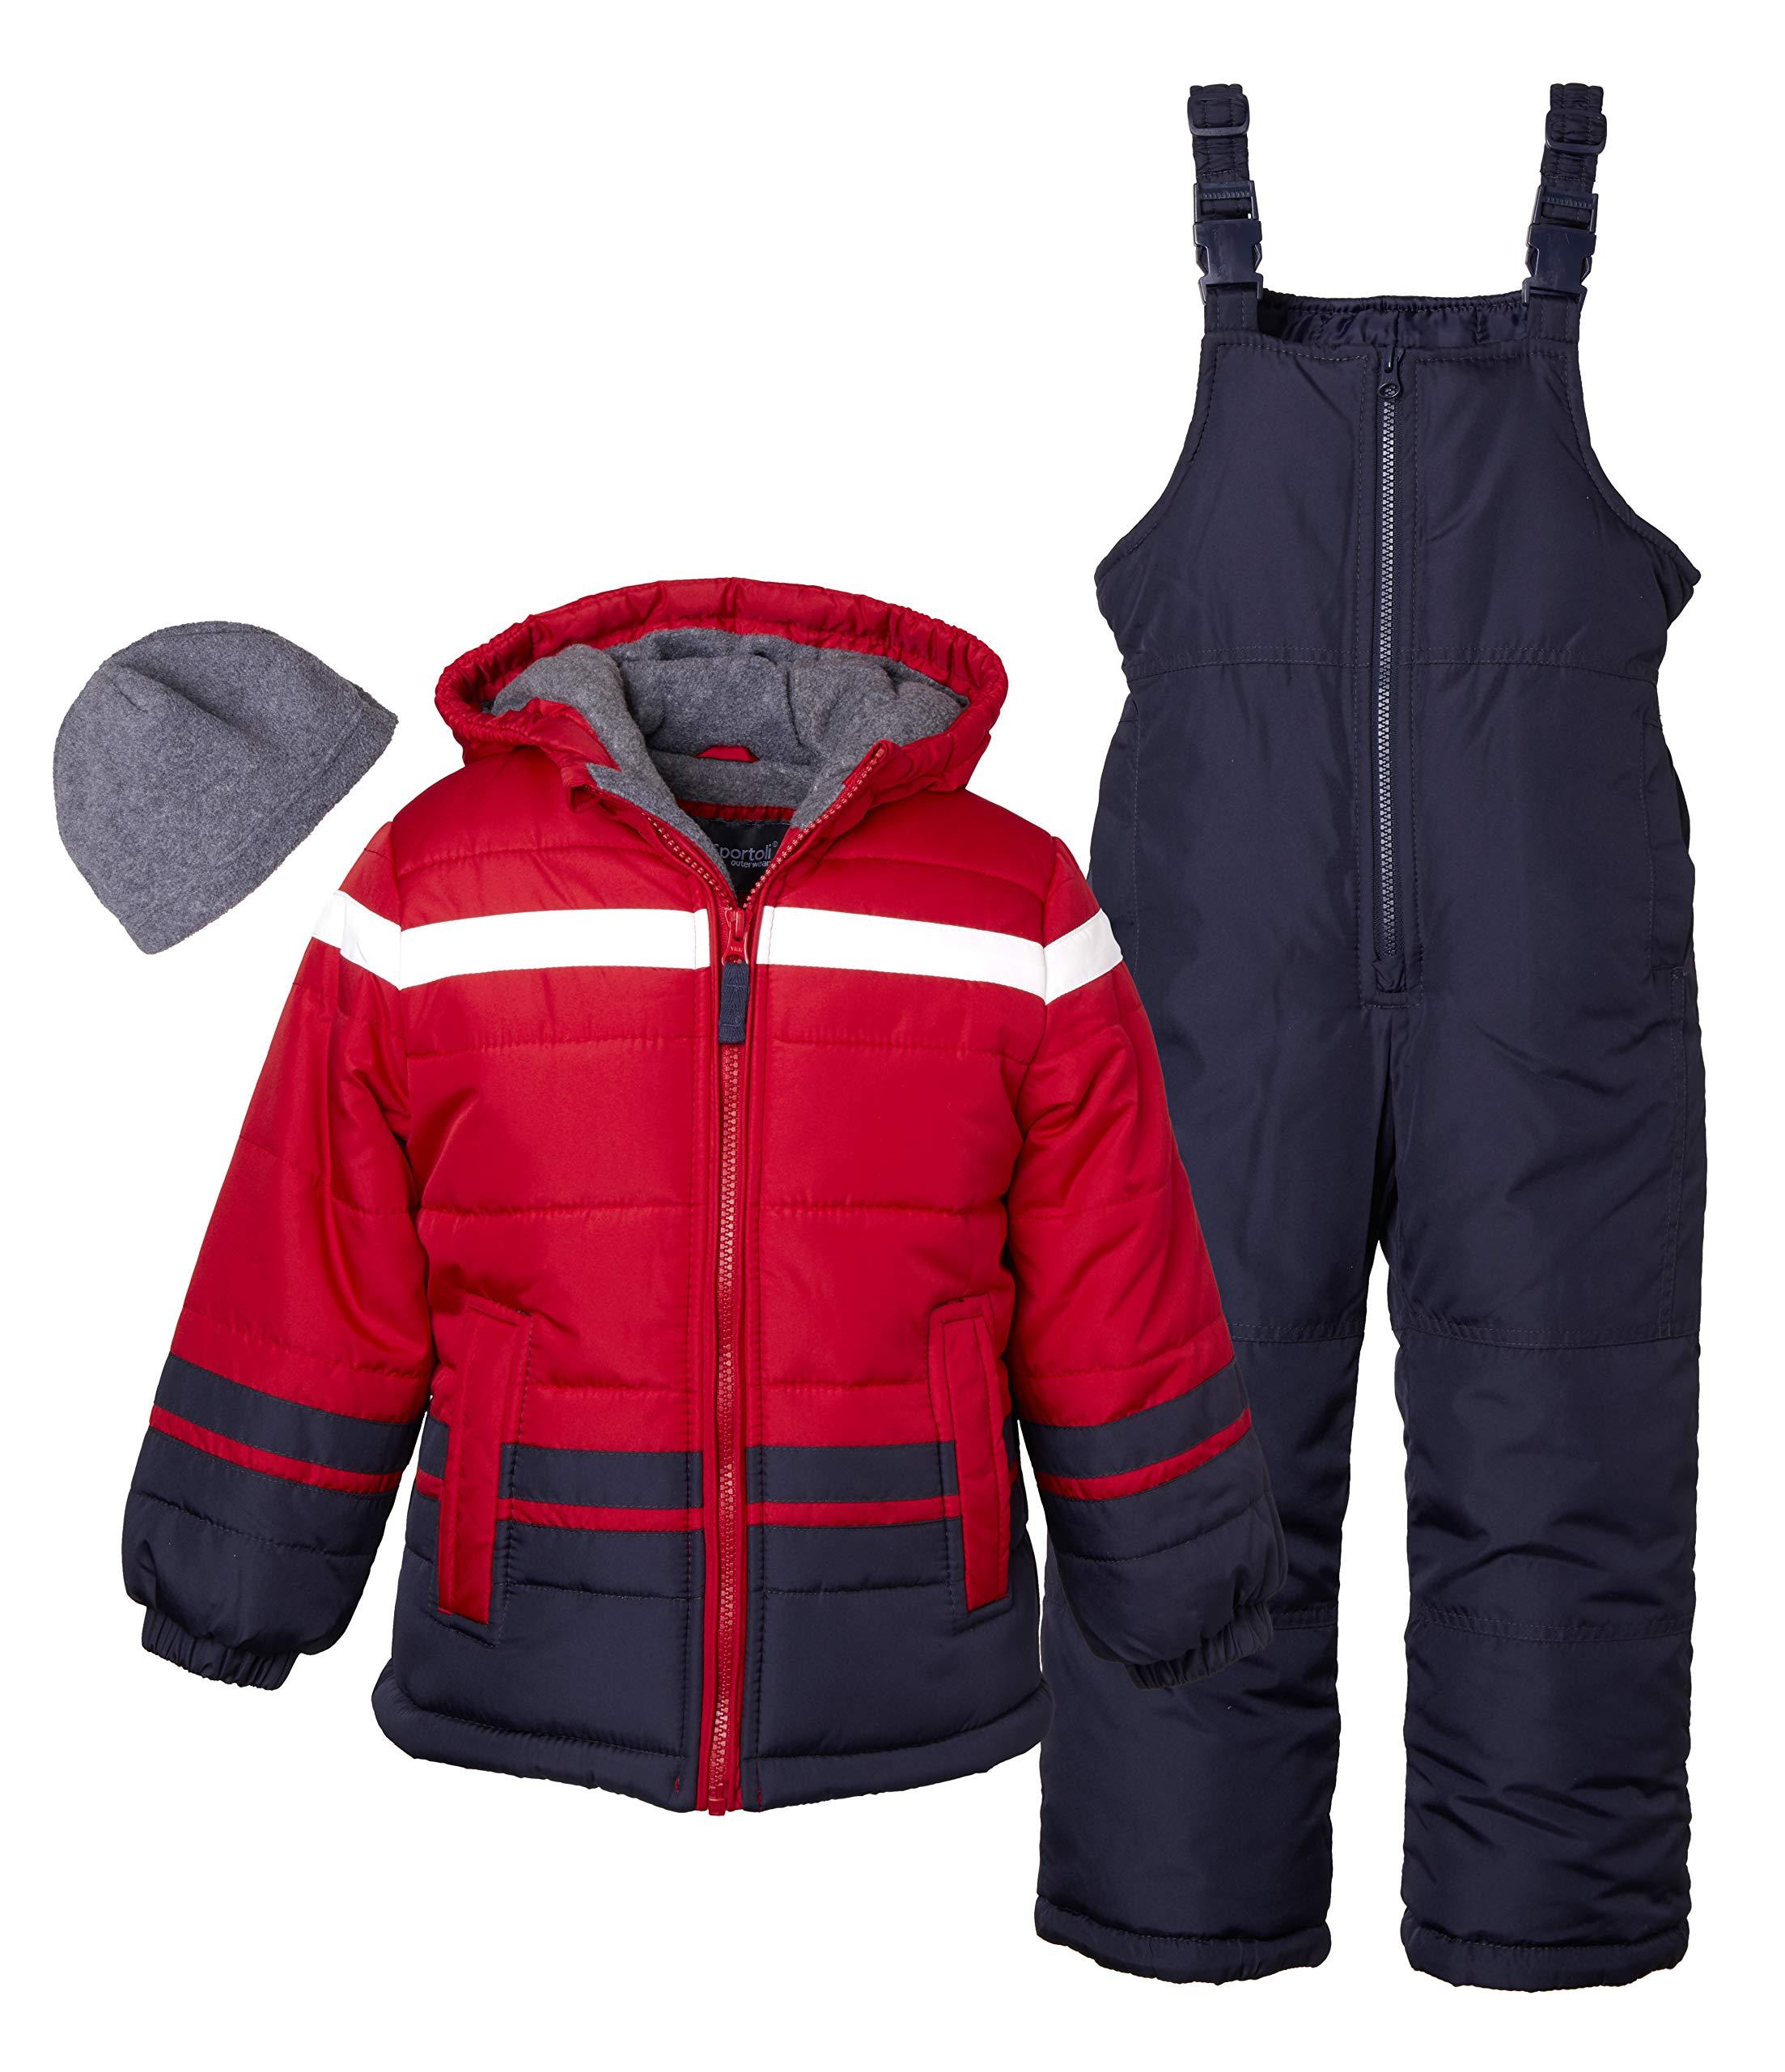 Sportoli Boys' Kids Winter Snowboard Skiing Parka Jacket & Snow Bib Snowsuit Set - Red (Size 7) by Sportoli